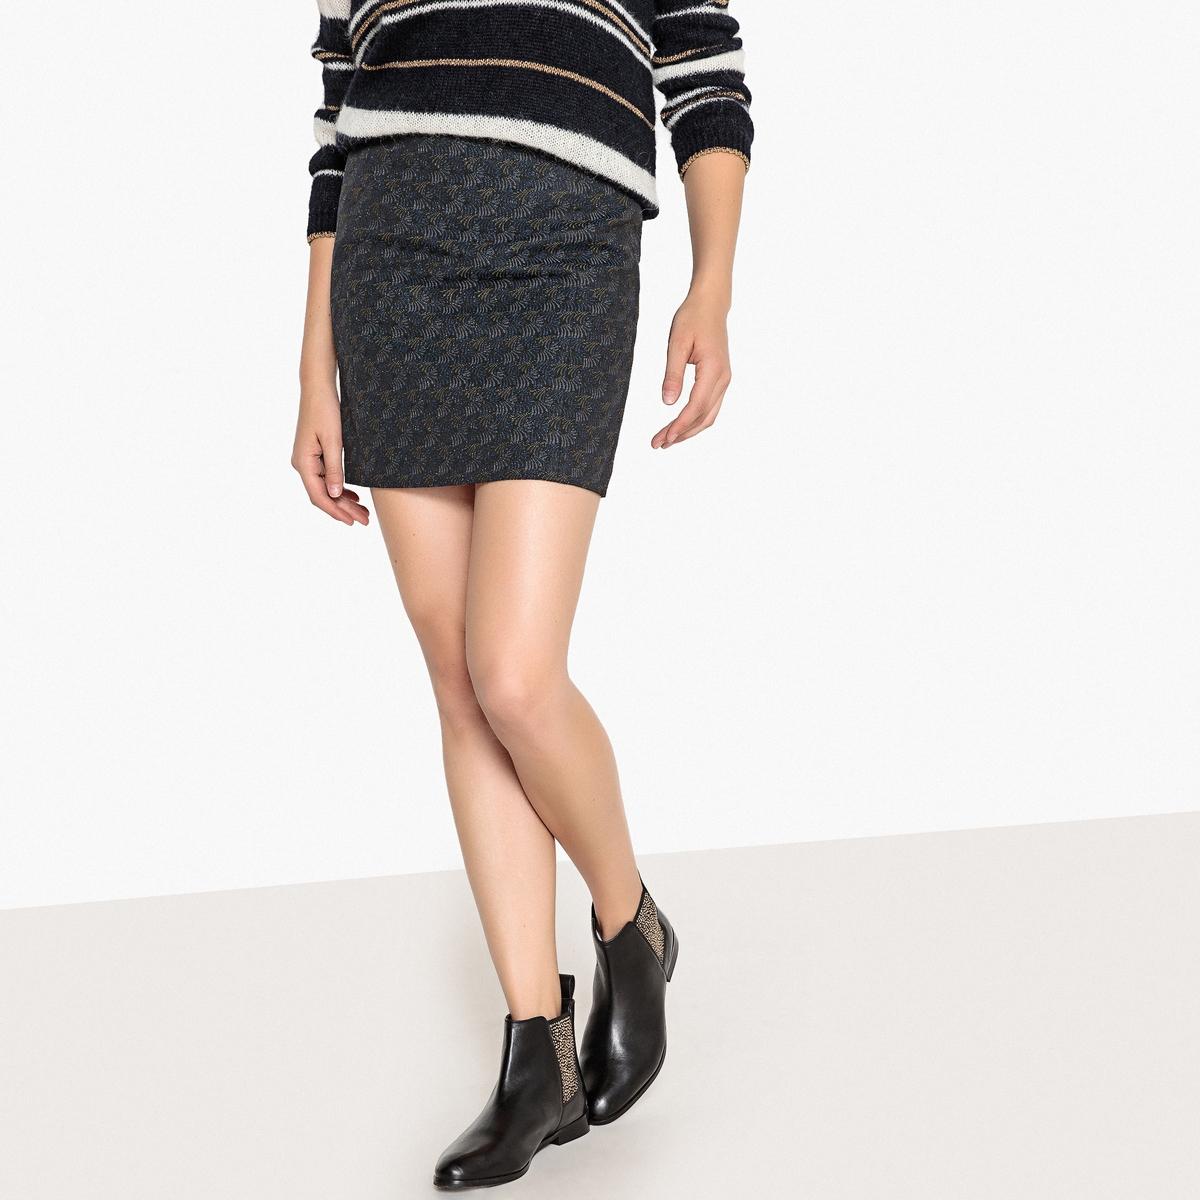 Юбка жаккардовая укороченная JARIUS юбка карандаш укороченная printio эскиз